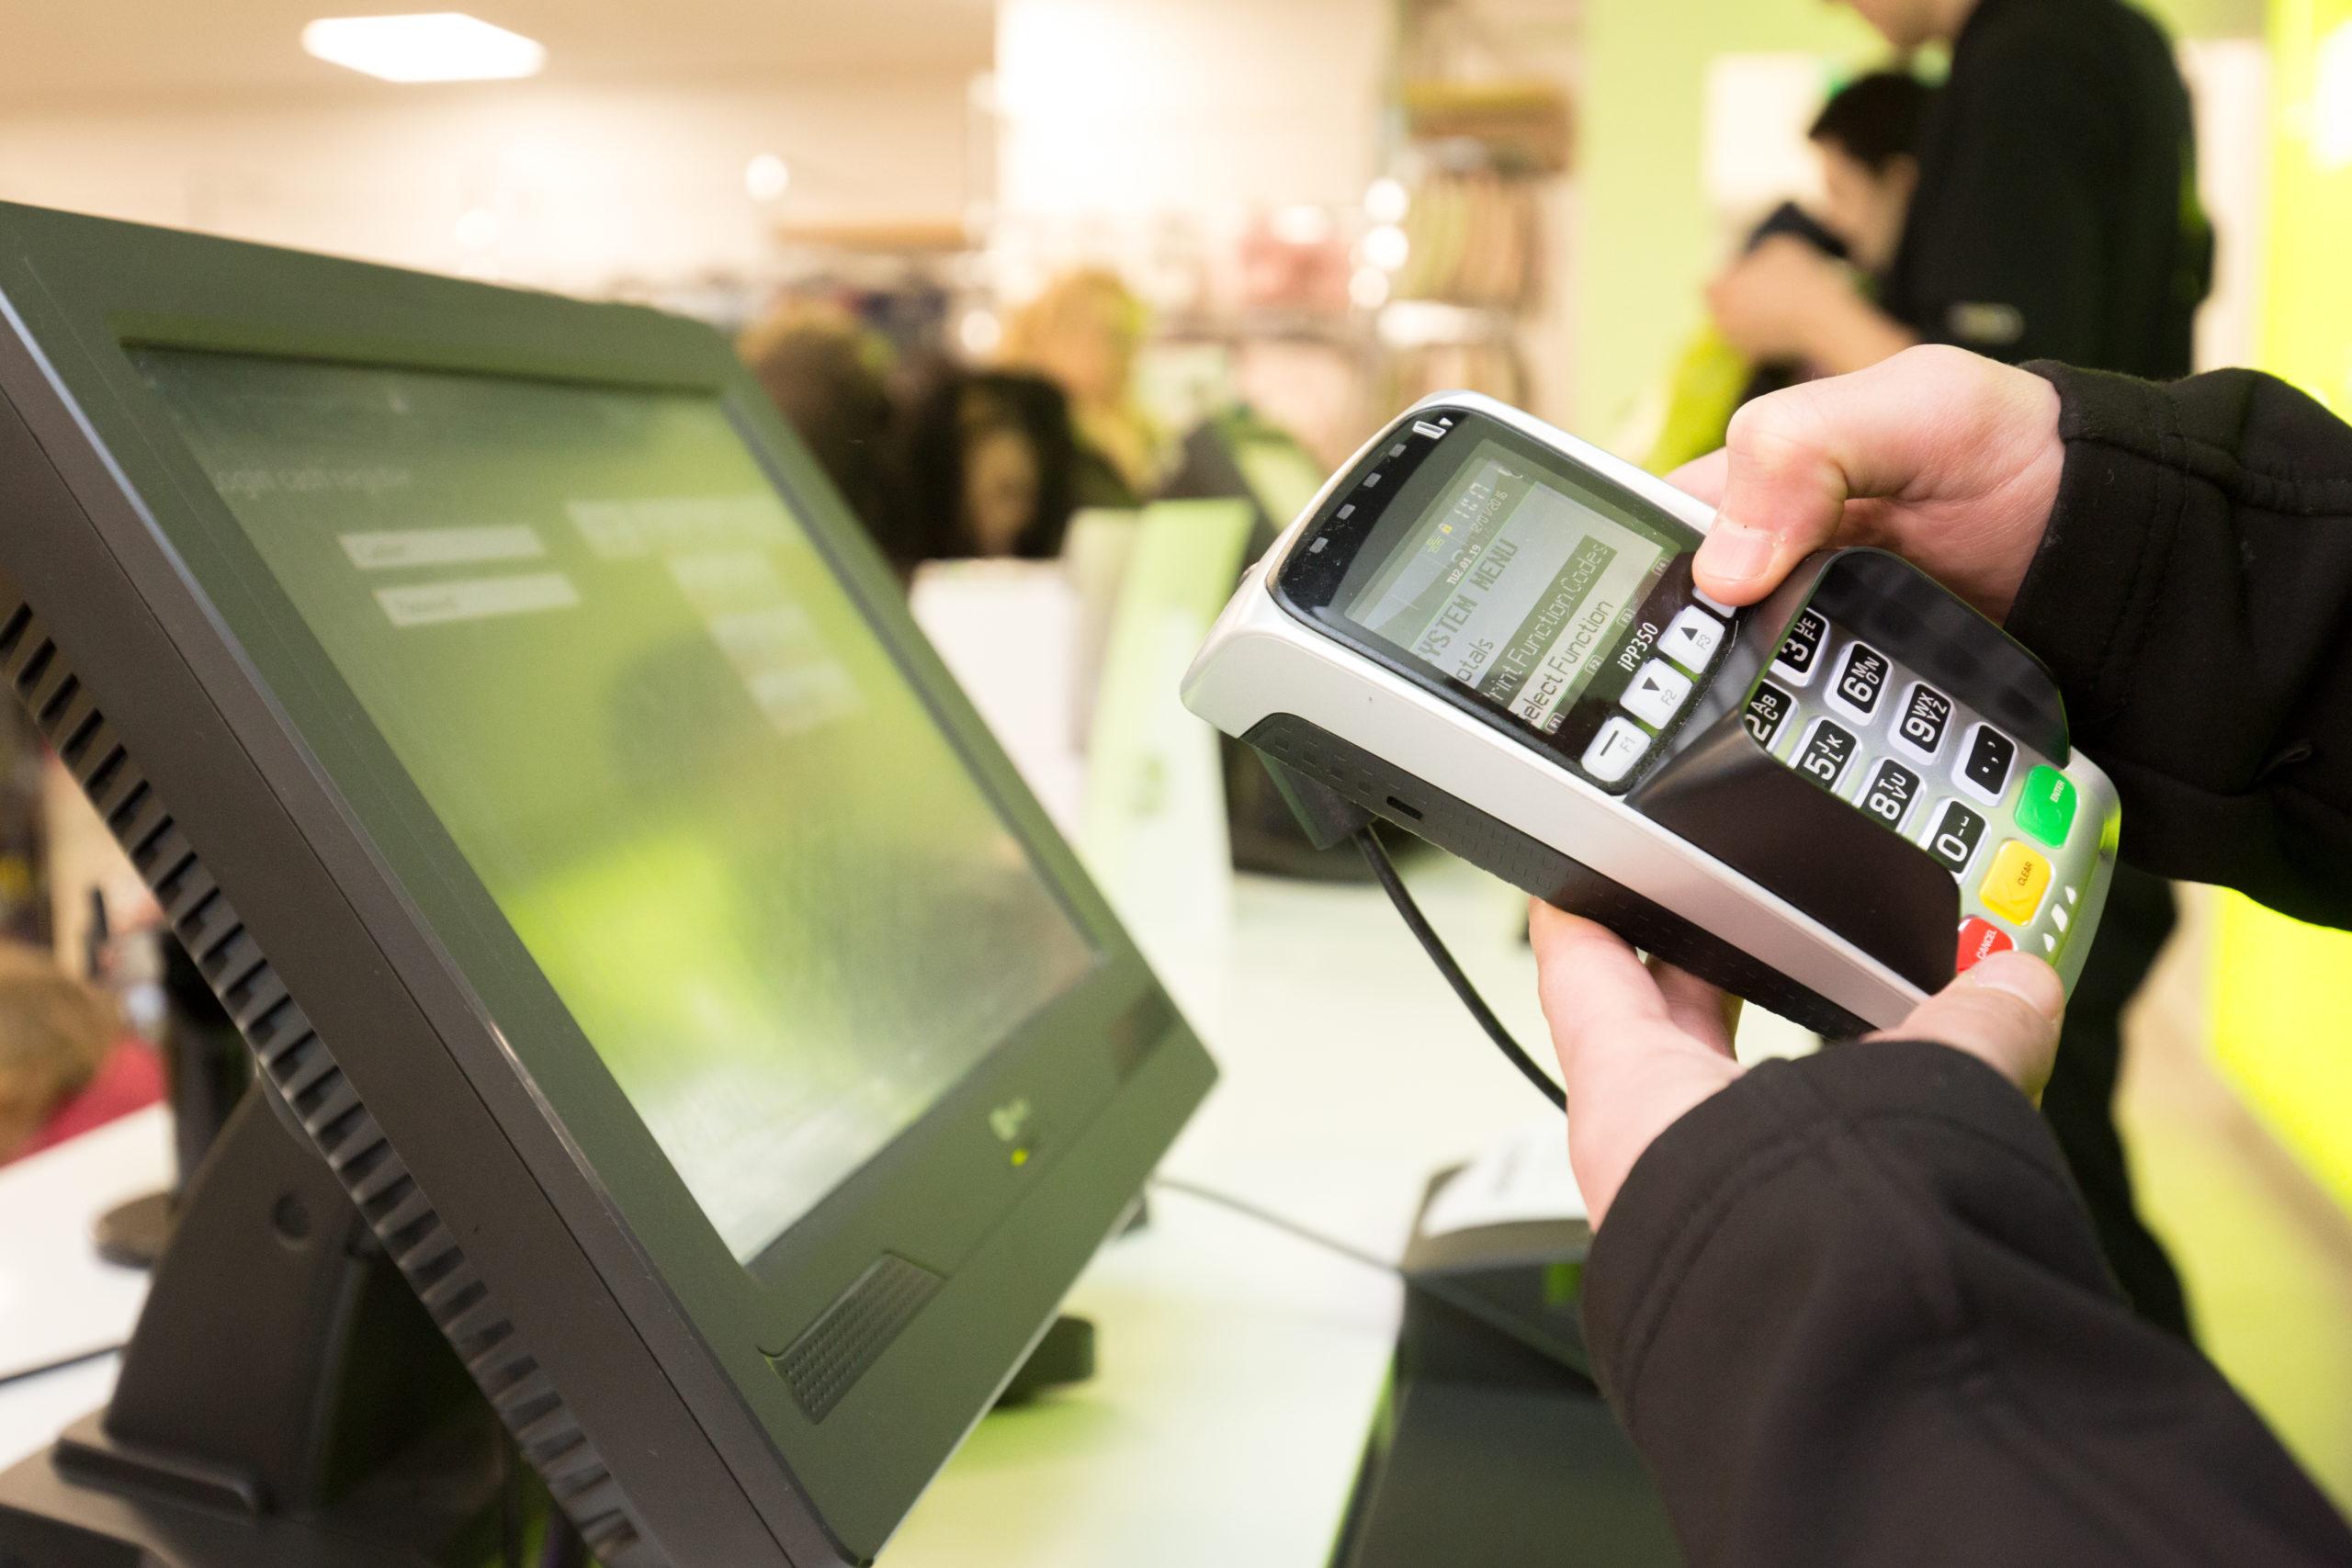 Barron McCann installs POS hardware for retailer